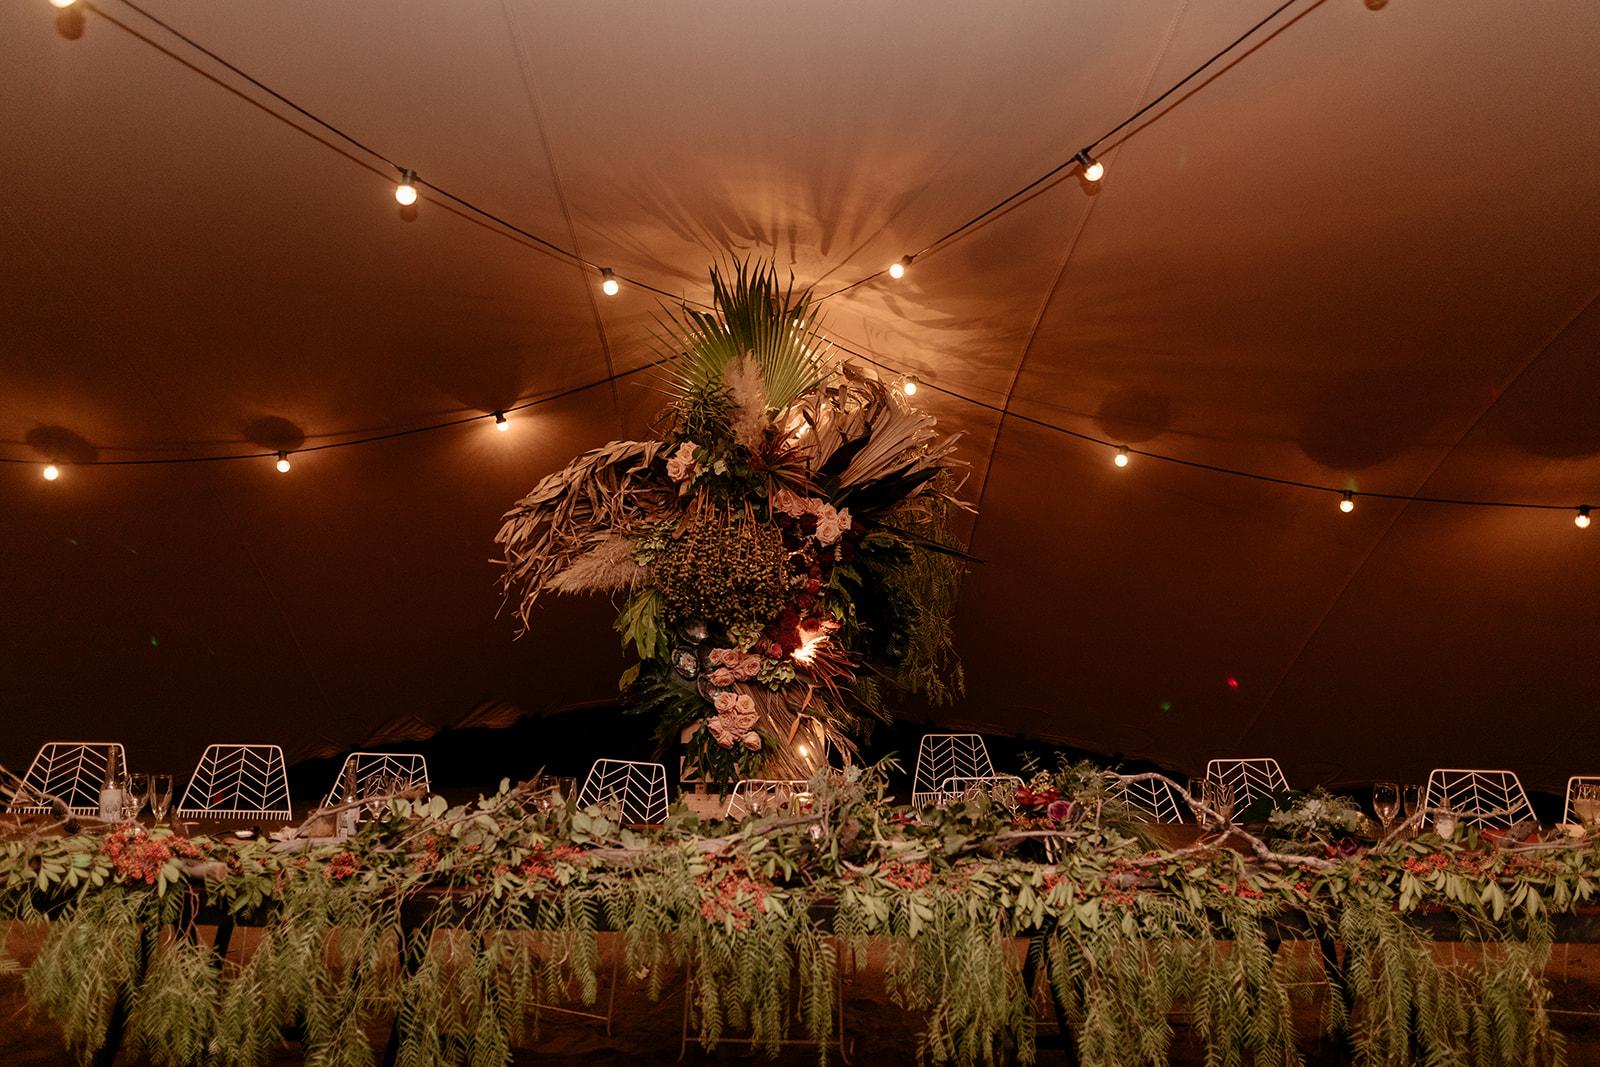 SiTI & DANIEL - Wheatbelt wedding extradionarreStefanie Buma Weddings